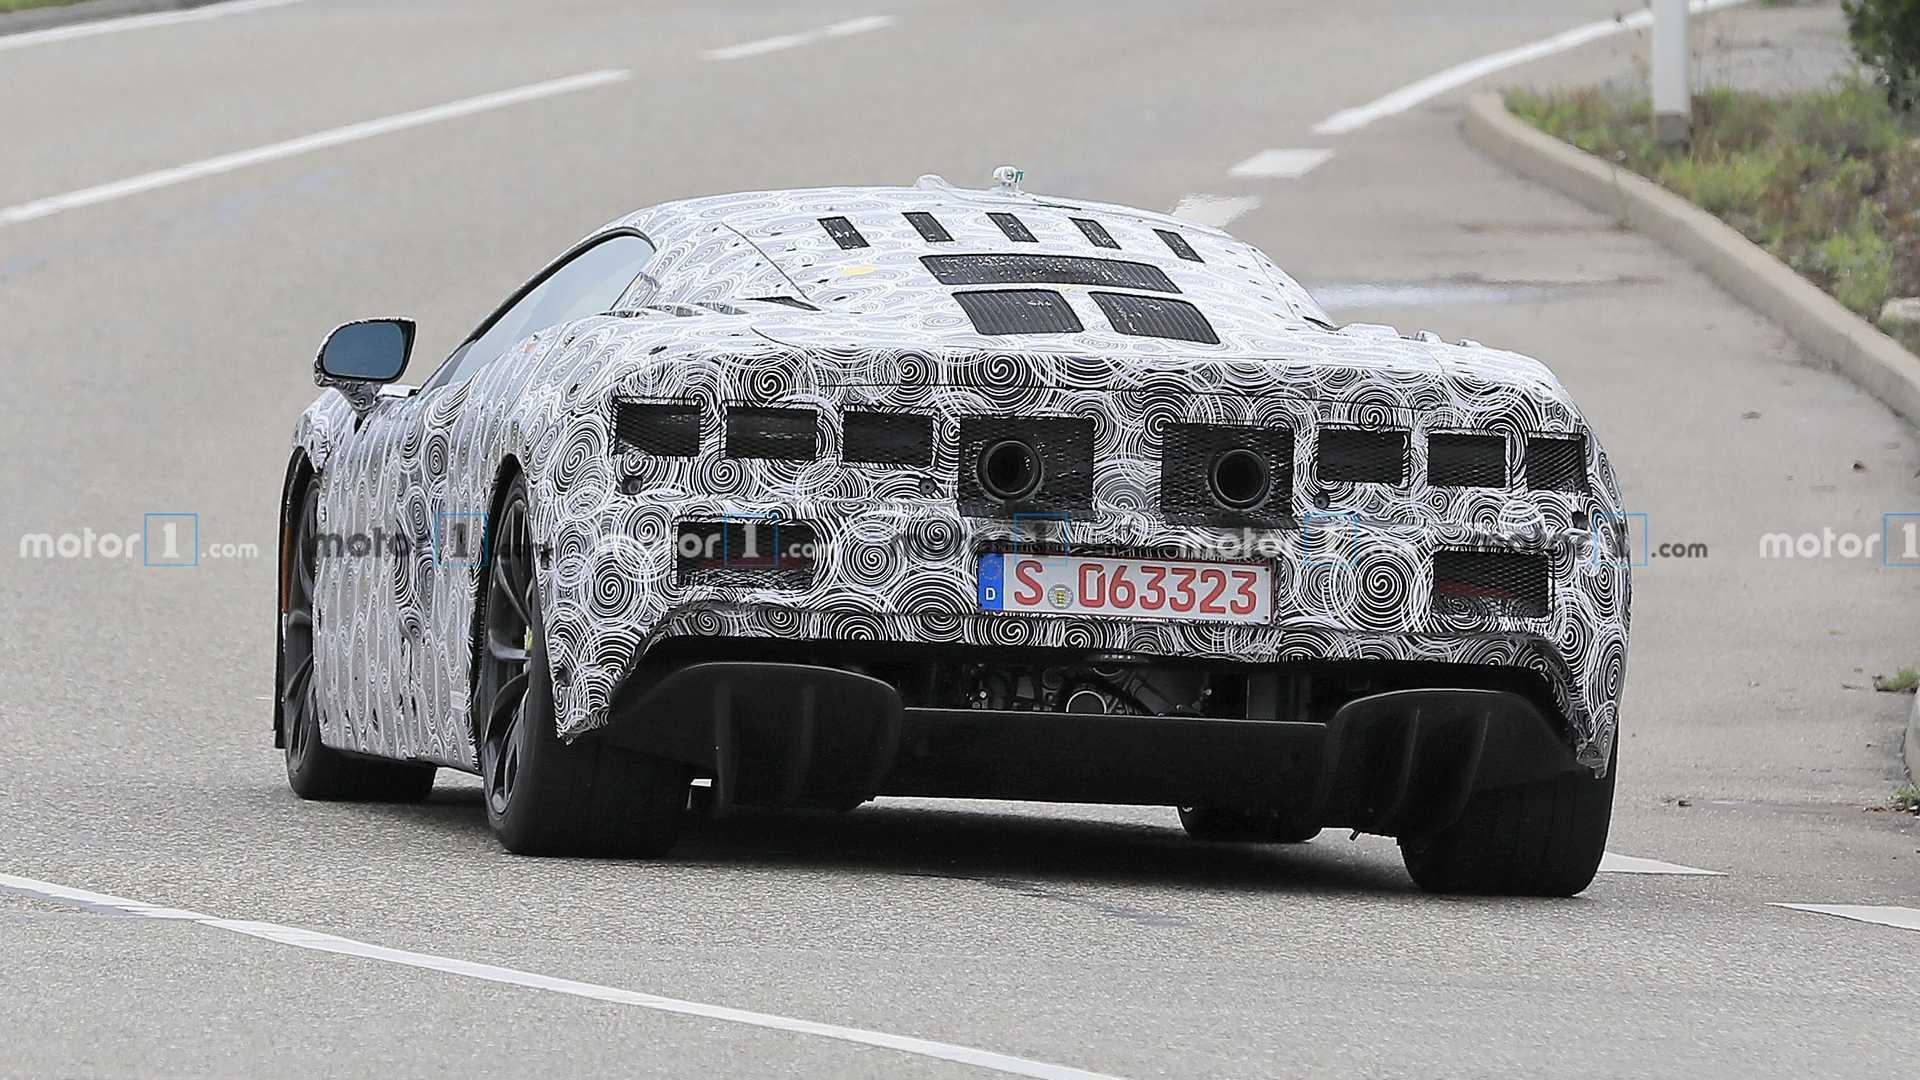 McLaren Sports Series Hybrid Rear Spy Photo